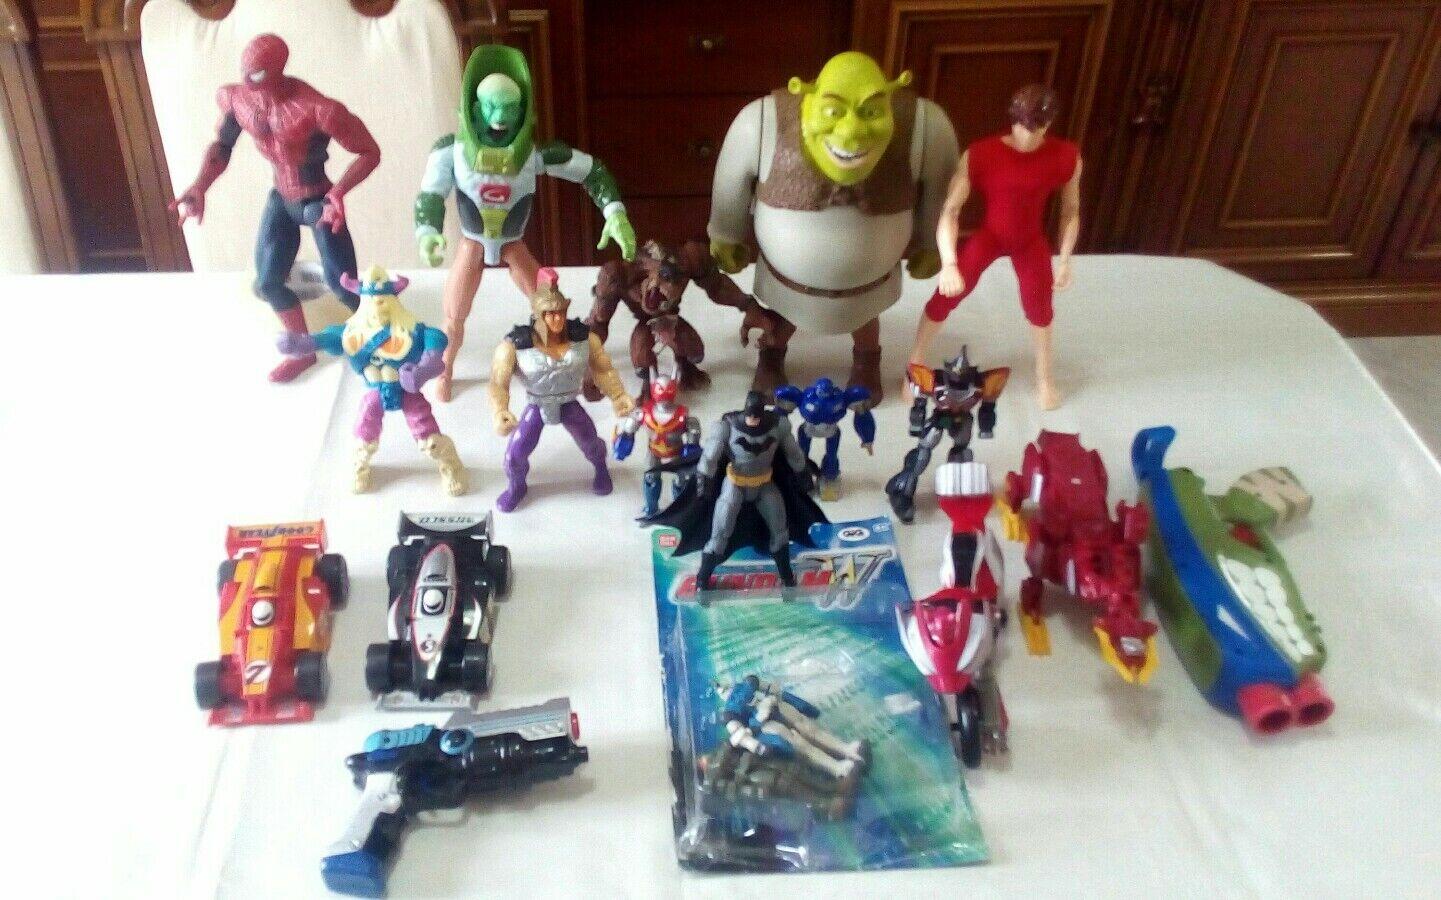 Stock giocattoli Shrek Pegasus Batman Spiderman Turtles GIG transformers vintage